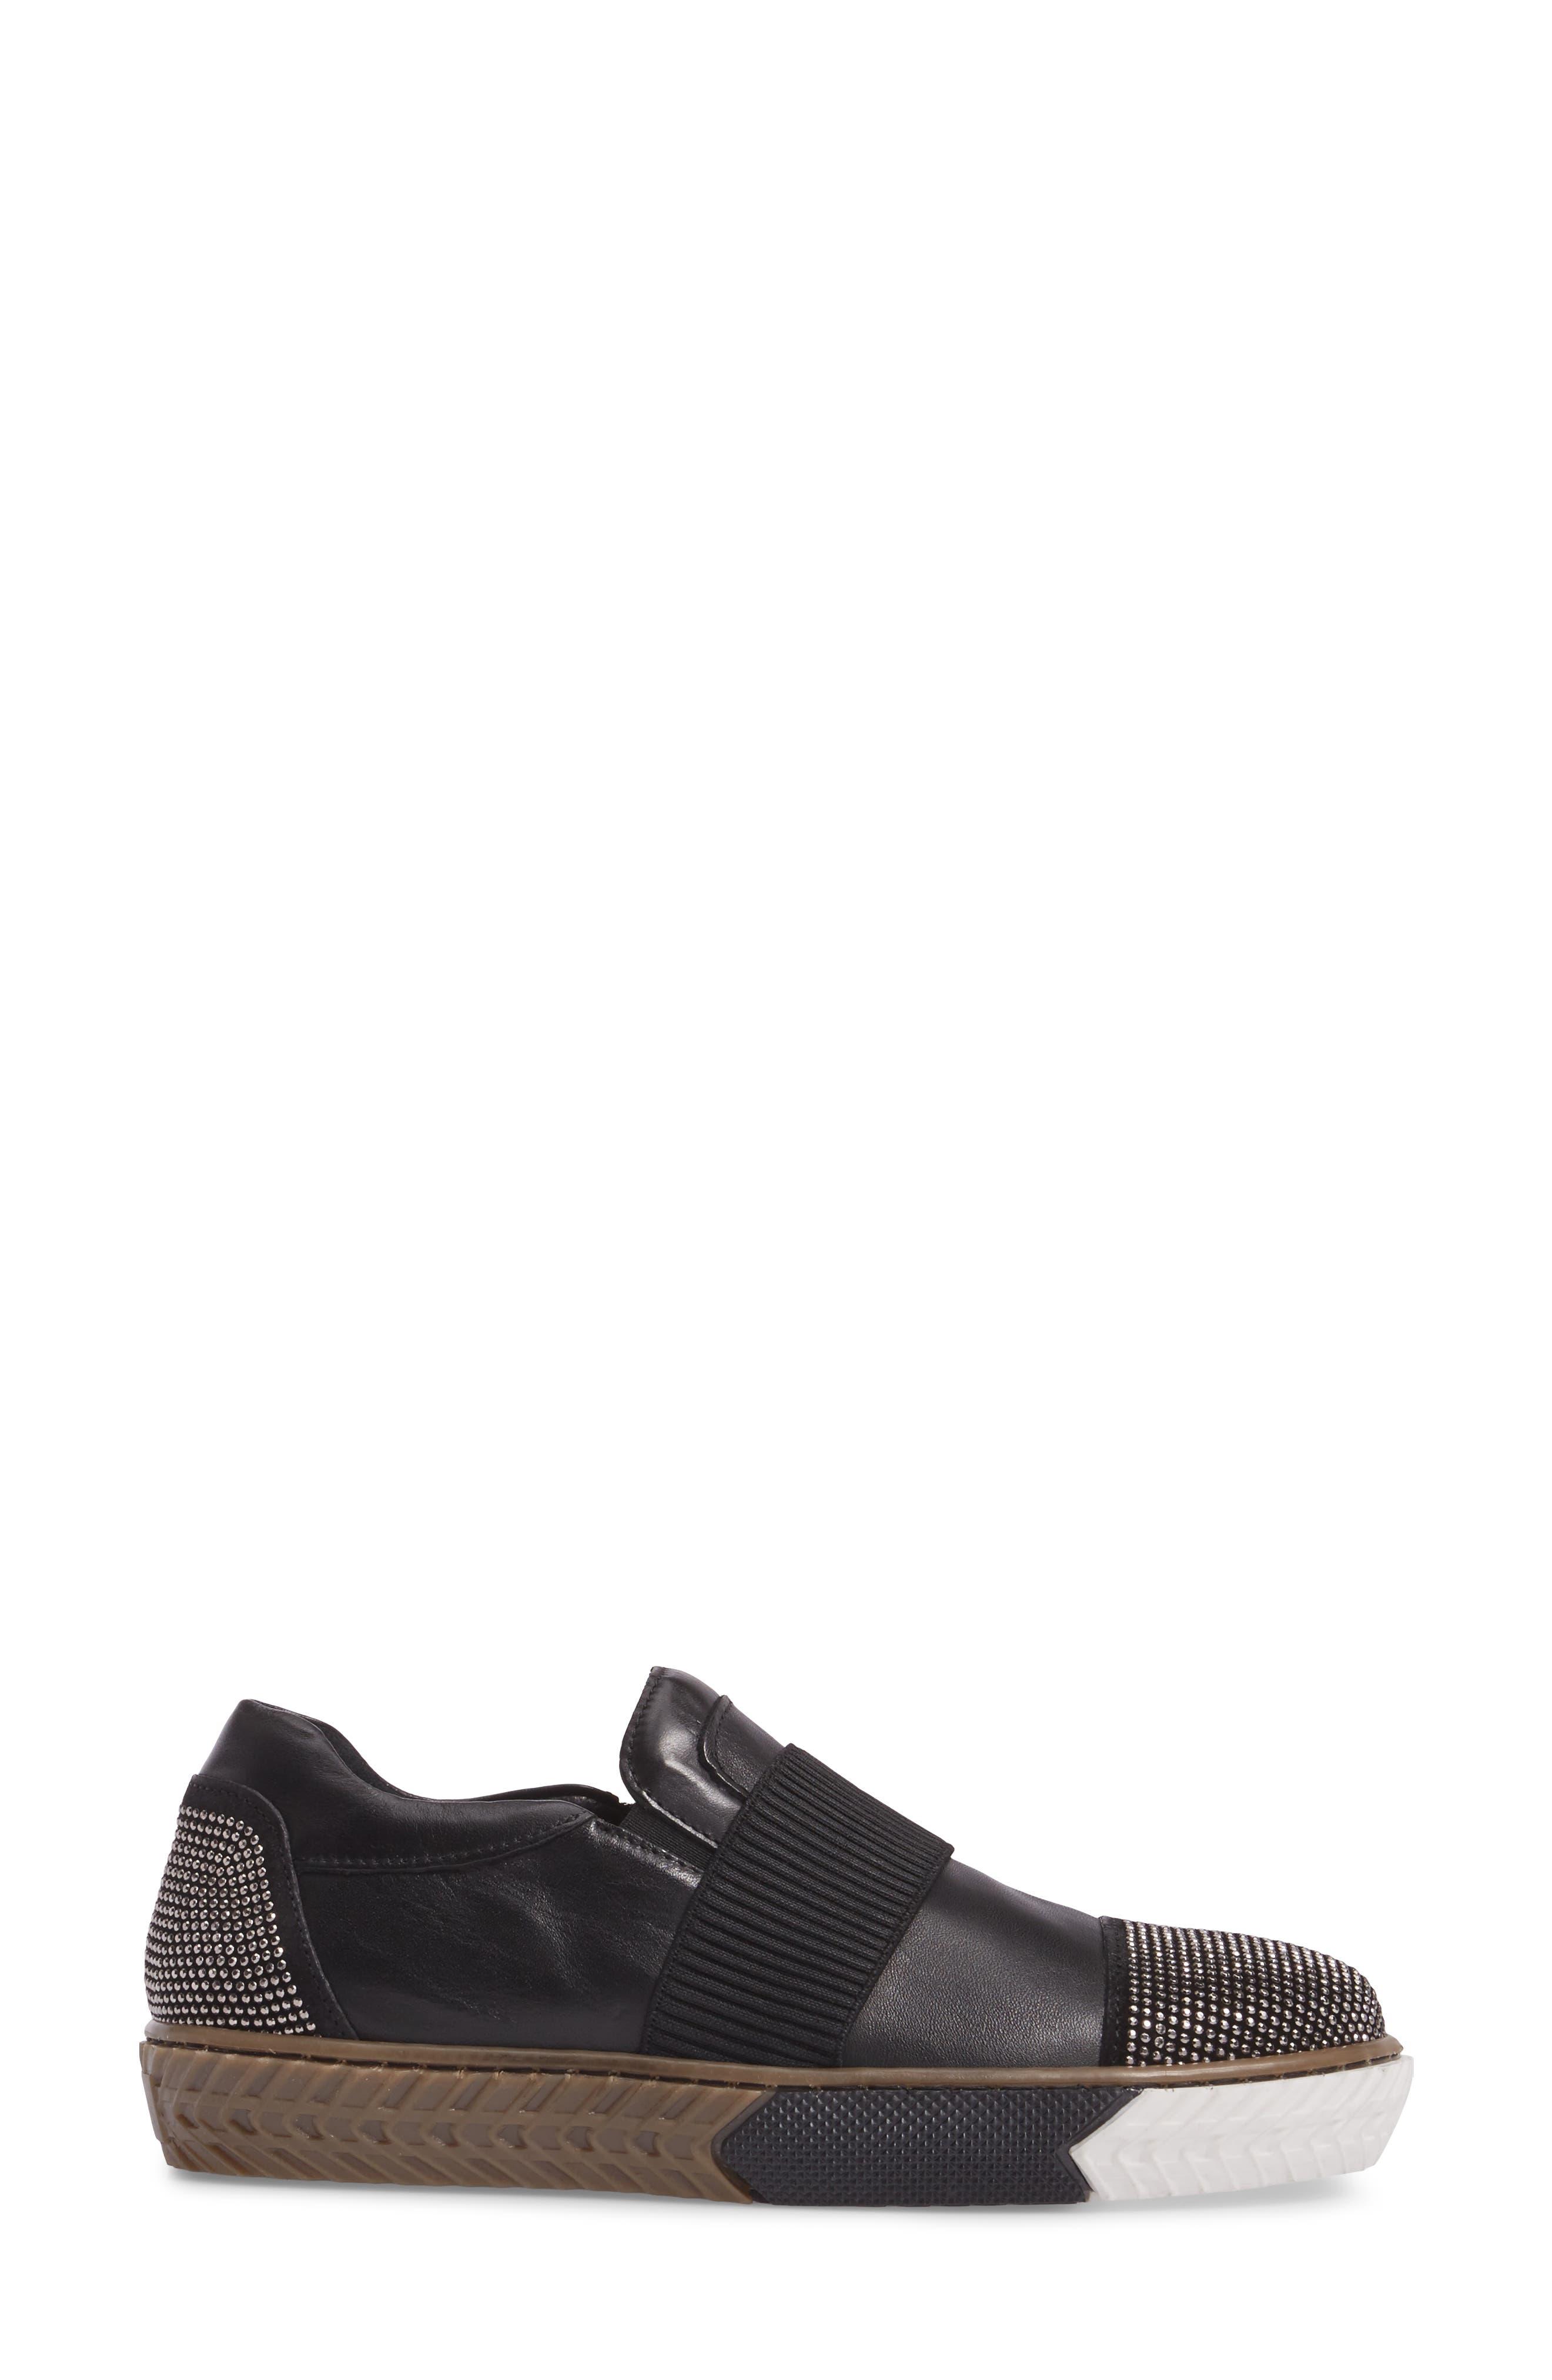 Alternate Image 3  - Sheridan Mia Vibe Slip-On Sneaker (Women)